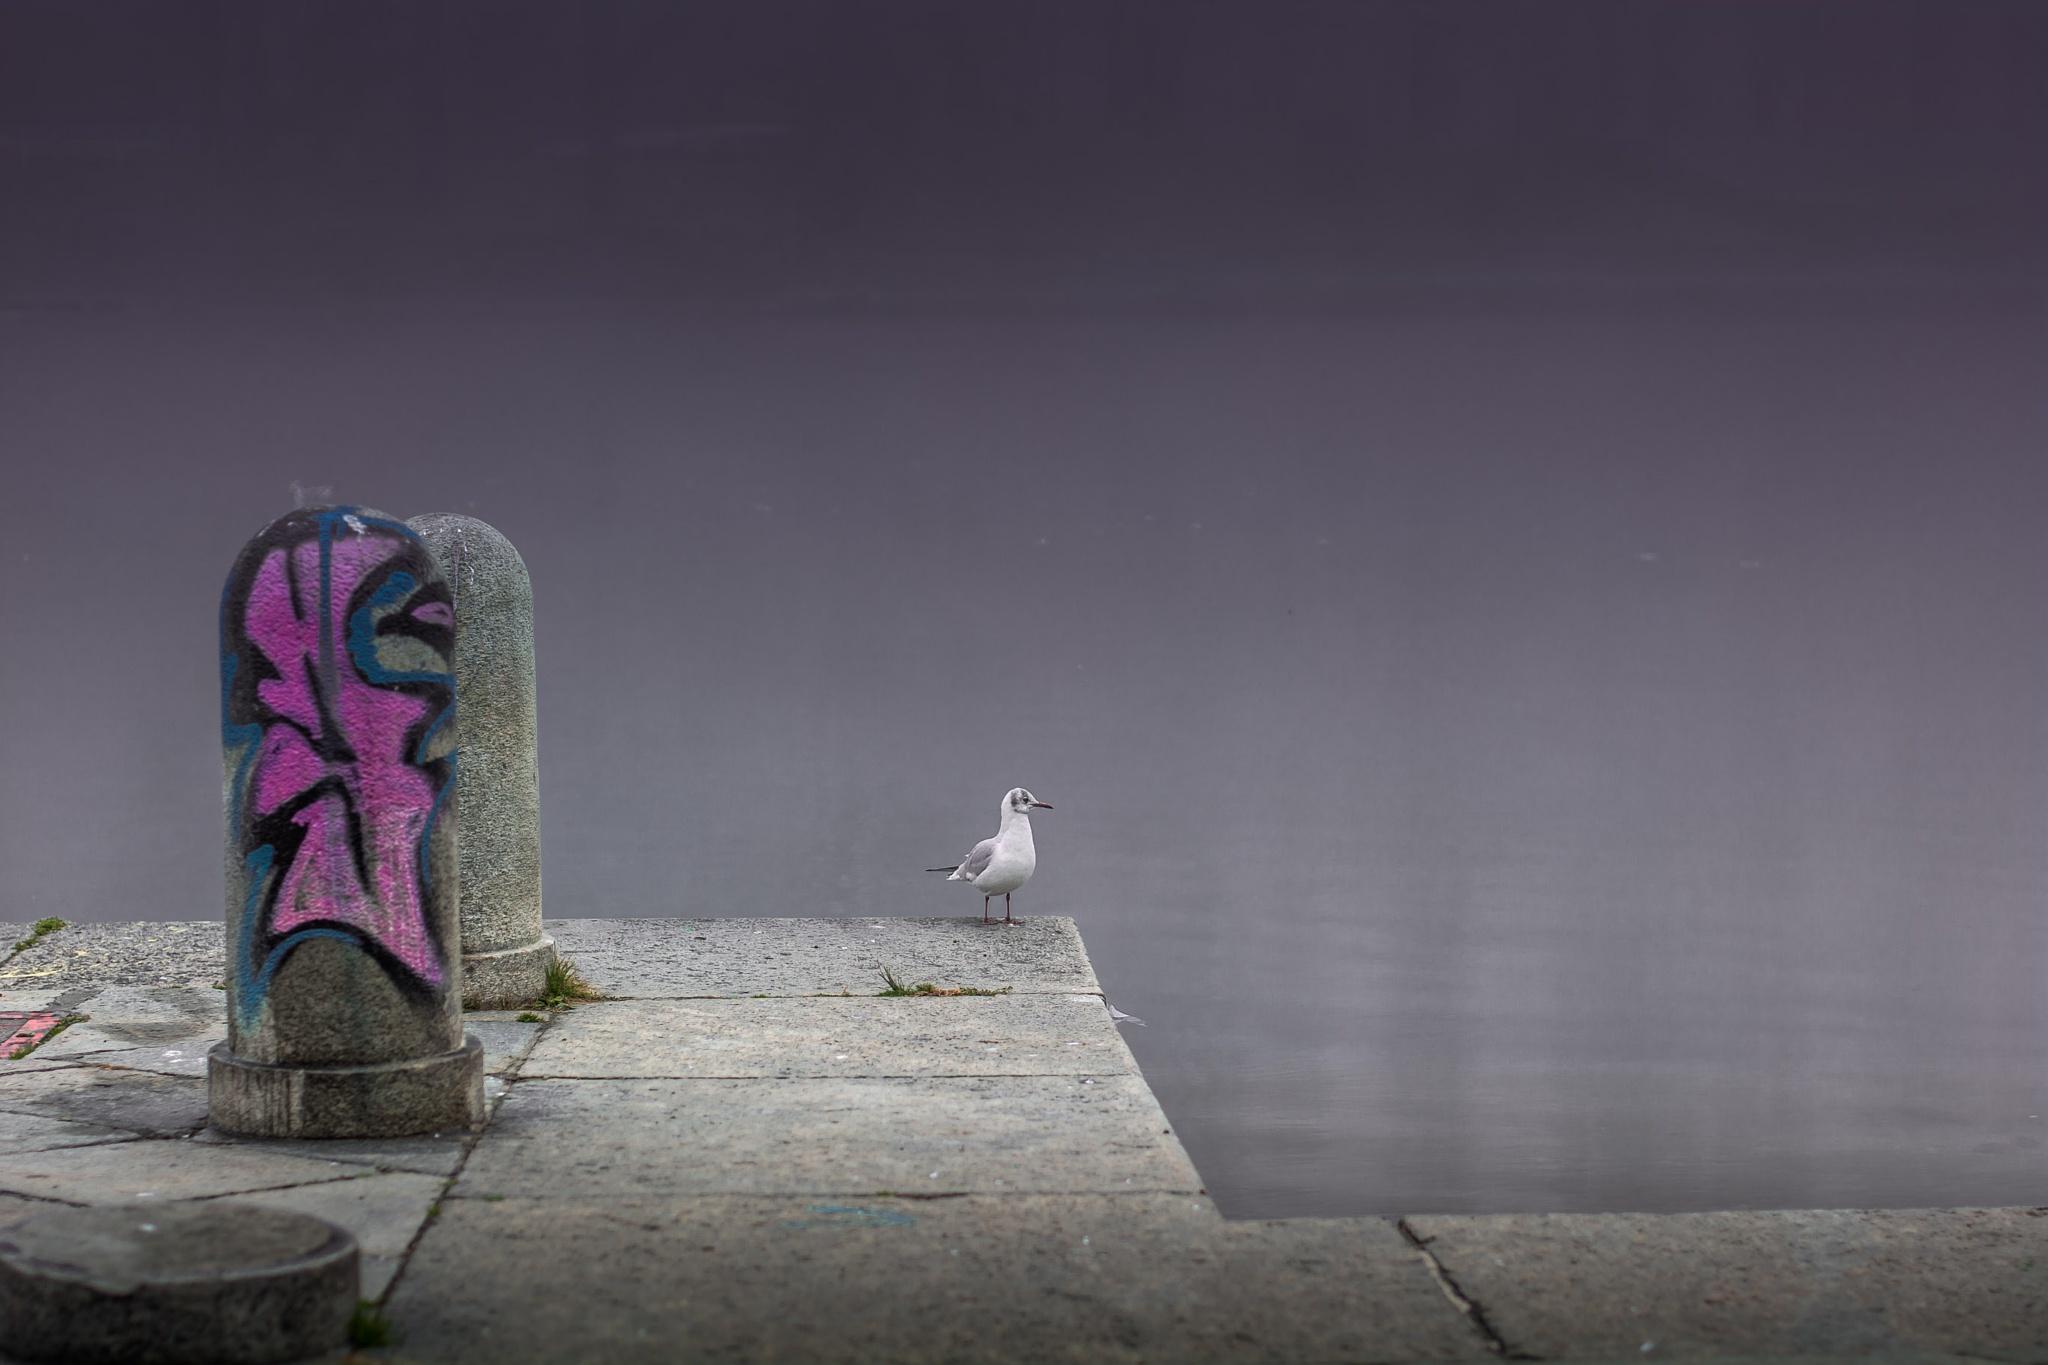 solitario by Luca Freni